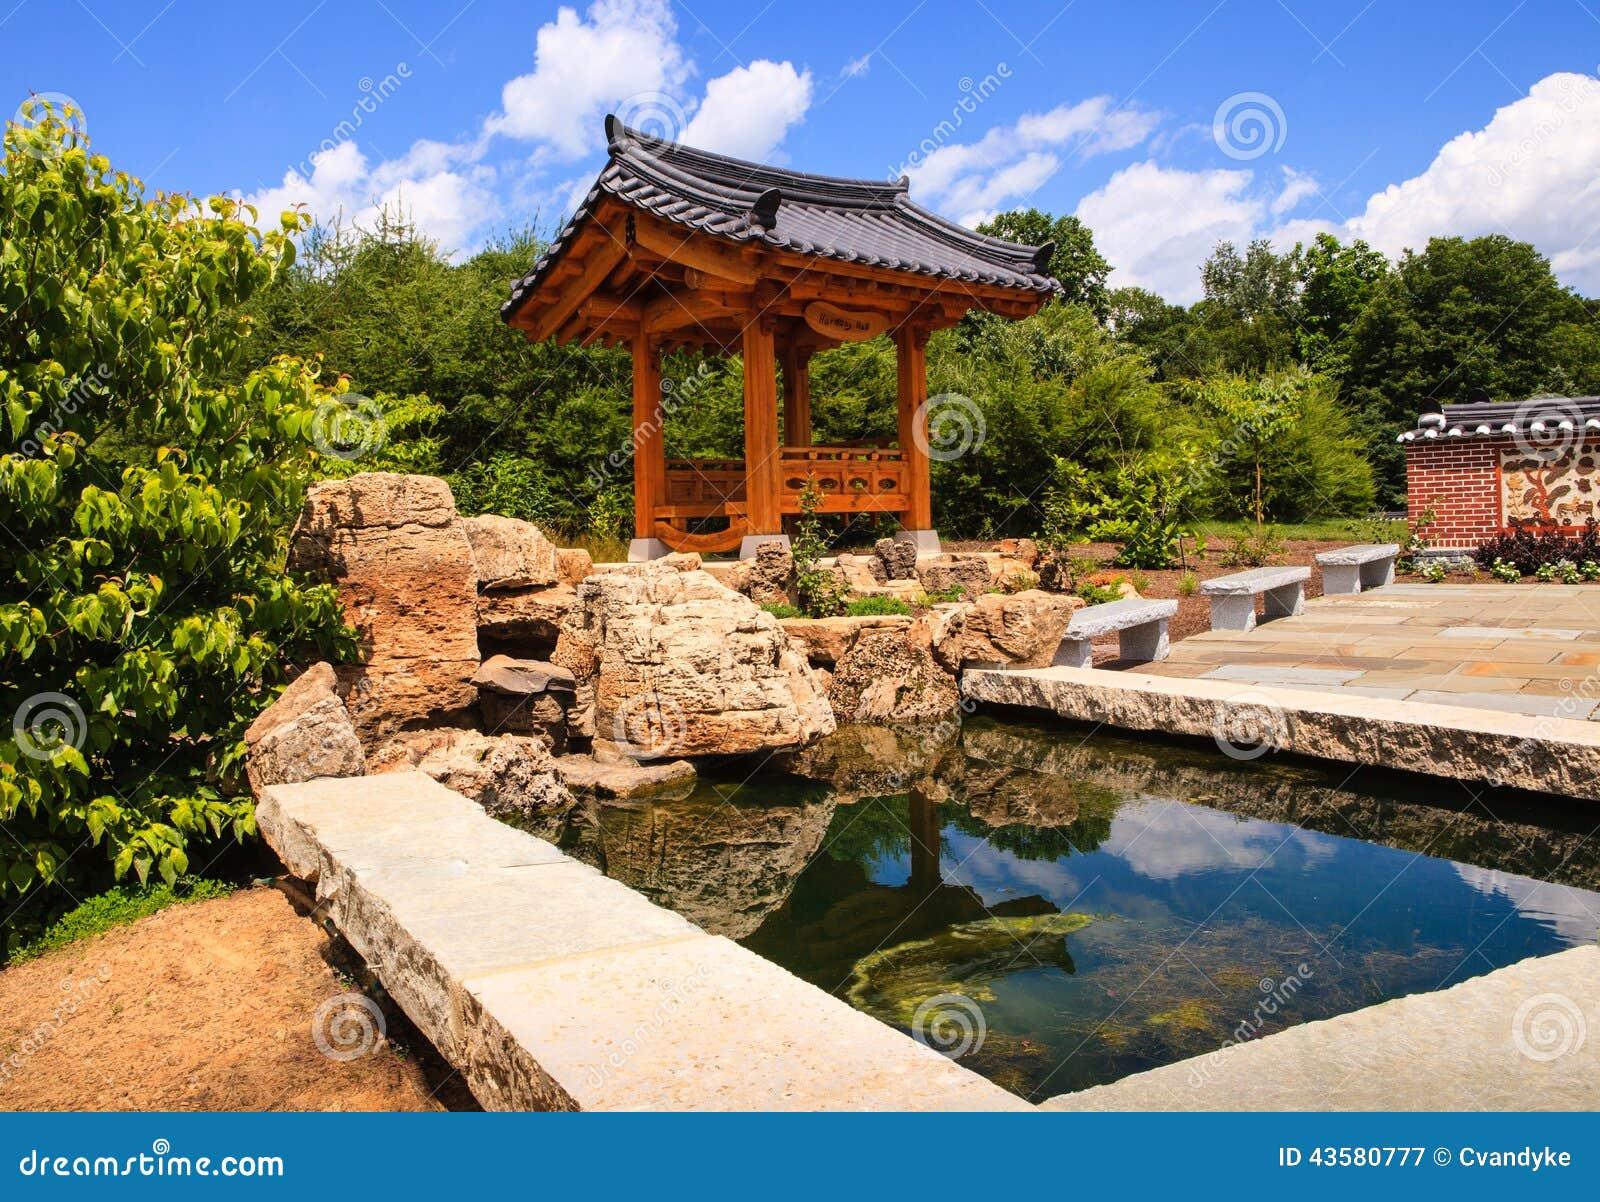 Colorful Korean Garden Illustration - Brown Nature Garden ...